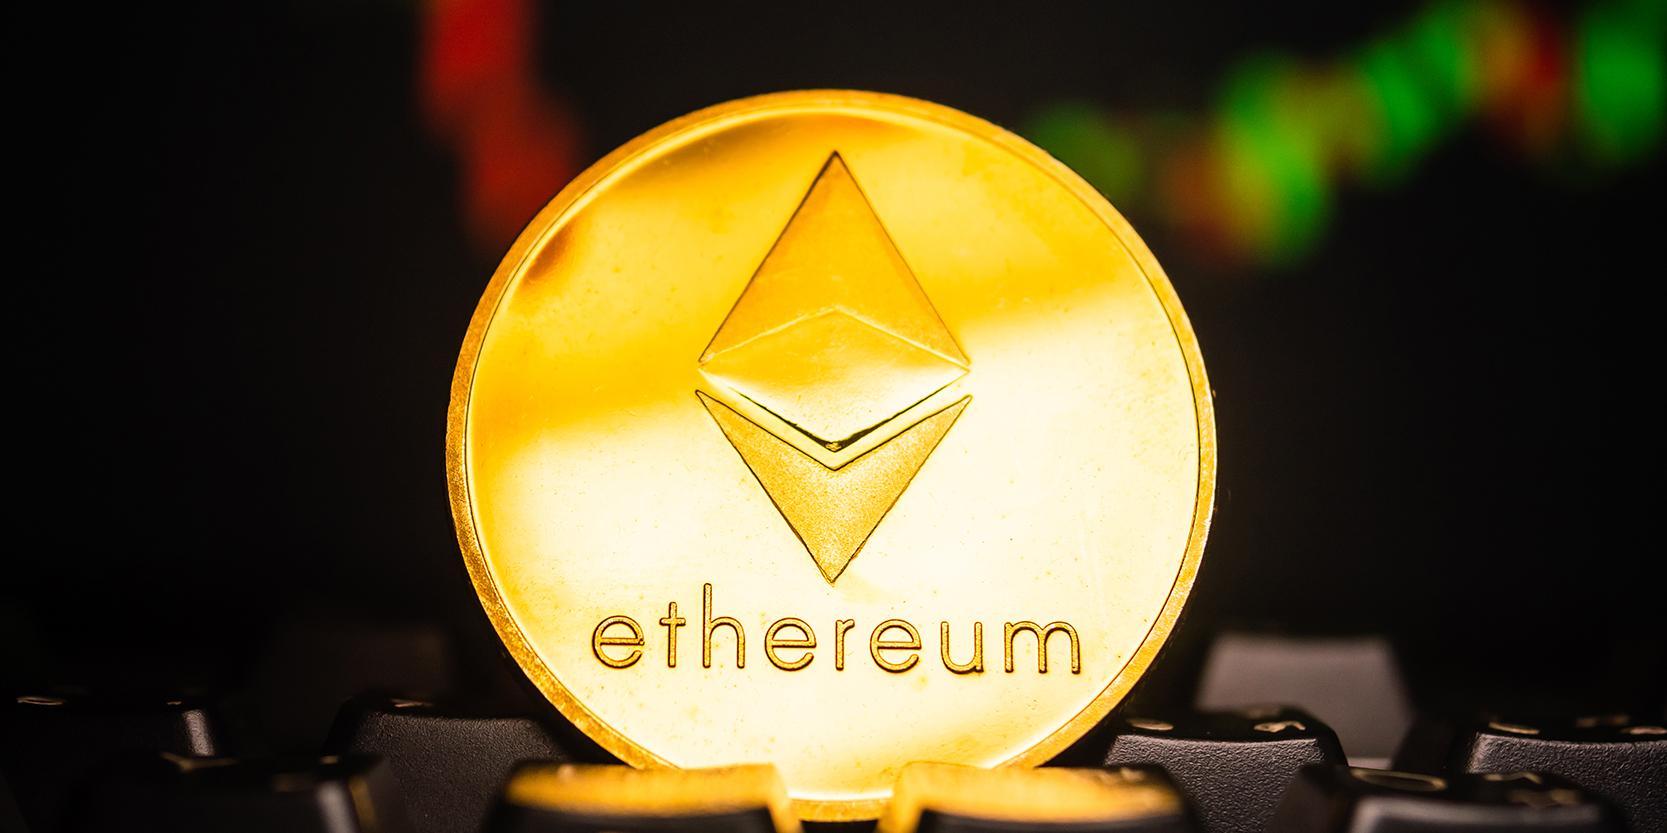 Ethereum Overview